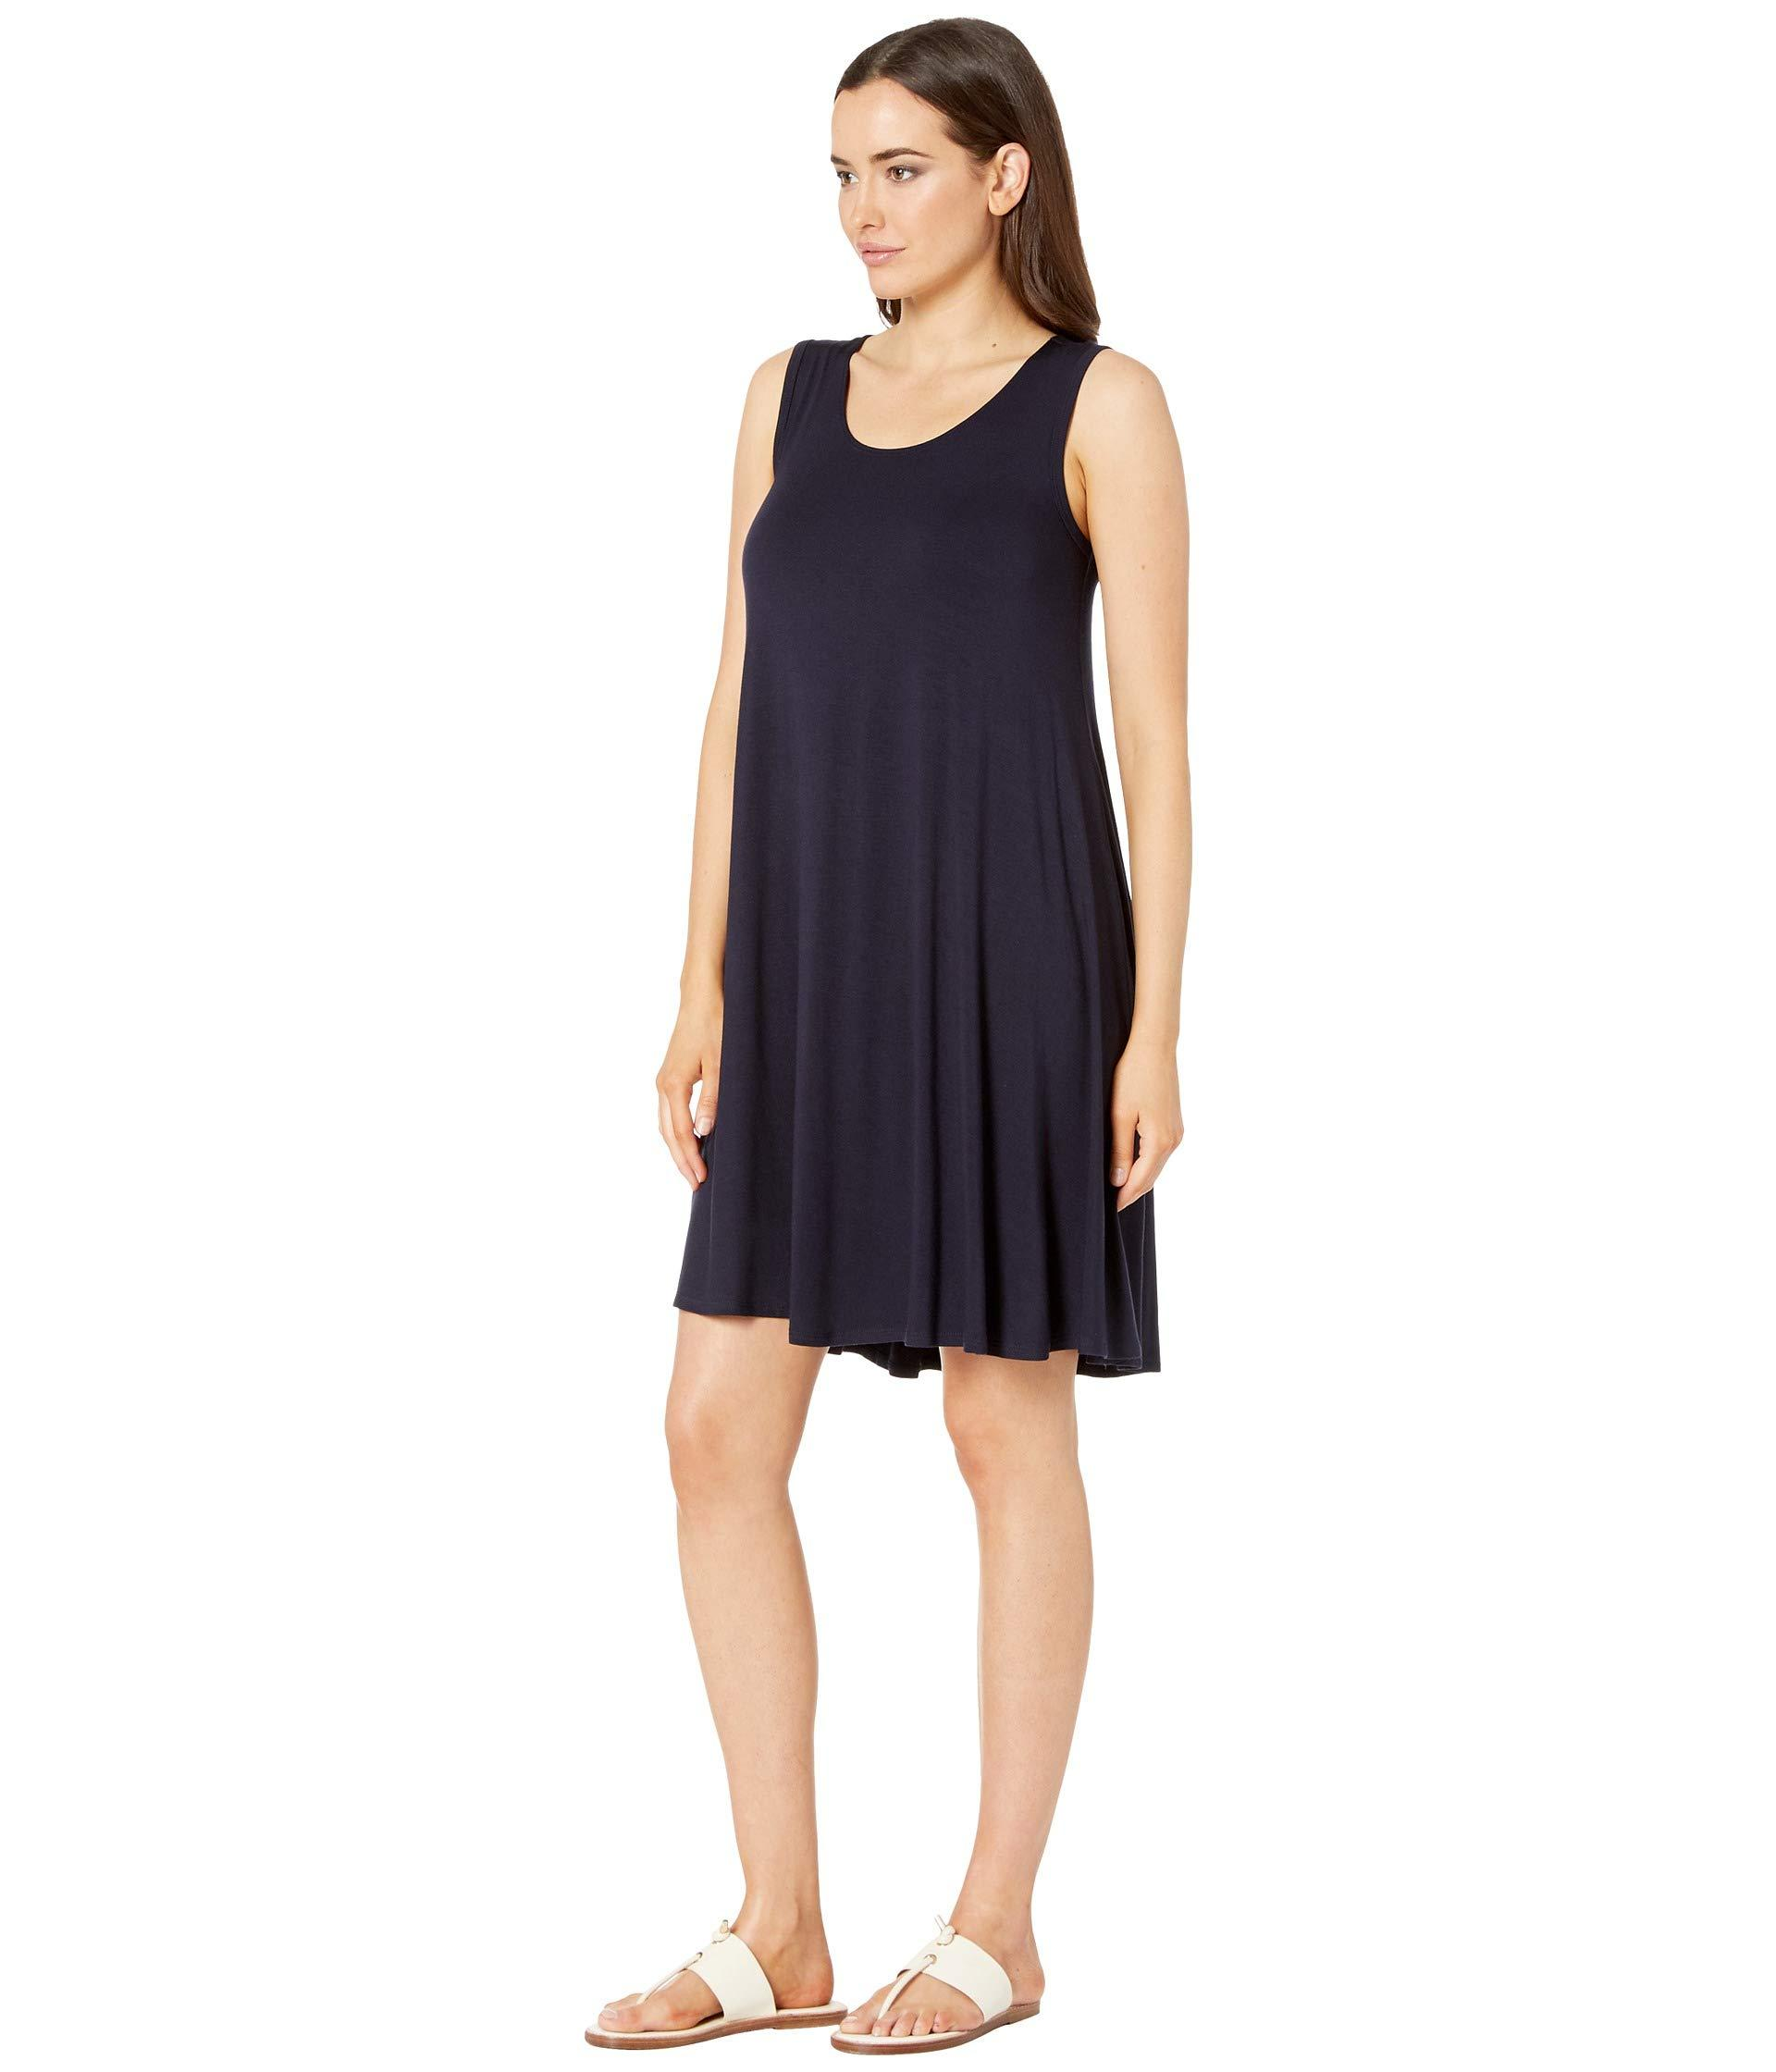 54b5b0604f8 Lyst - Karen Kane Maggie Trapeze Dress (navy) Women s Dress in Blue